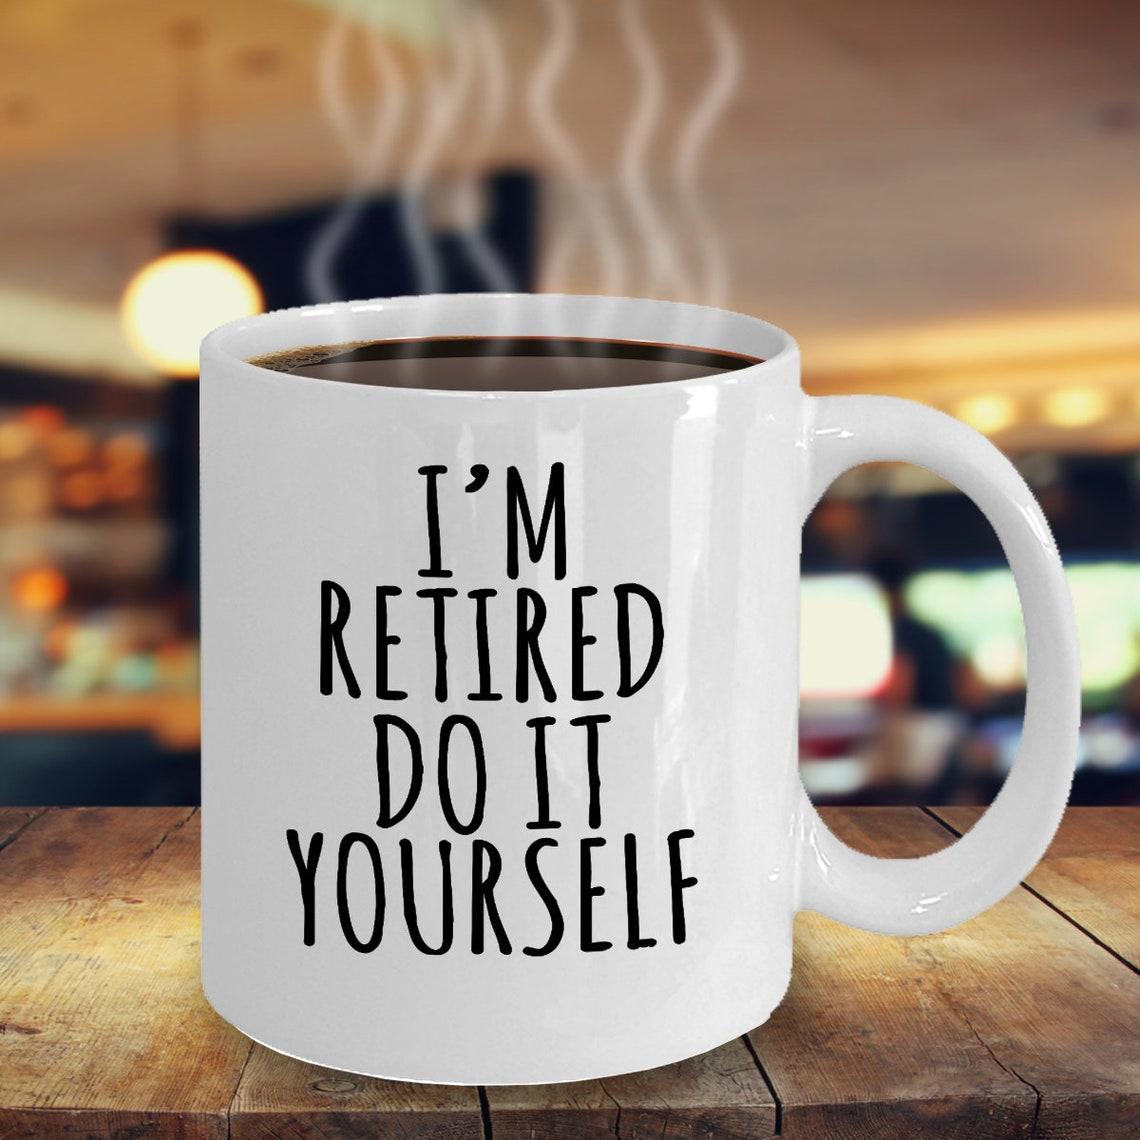 Funny I'm Retired Do It Yourself Mug